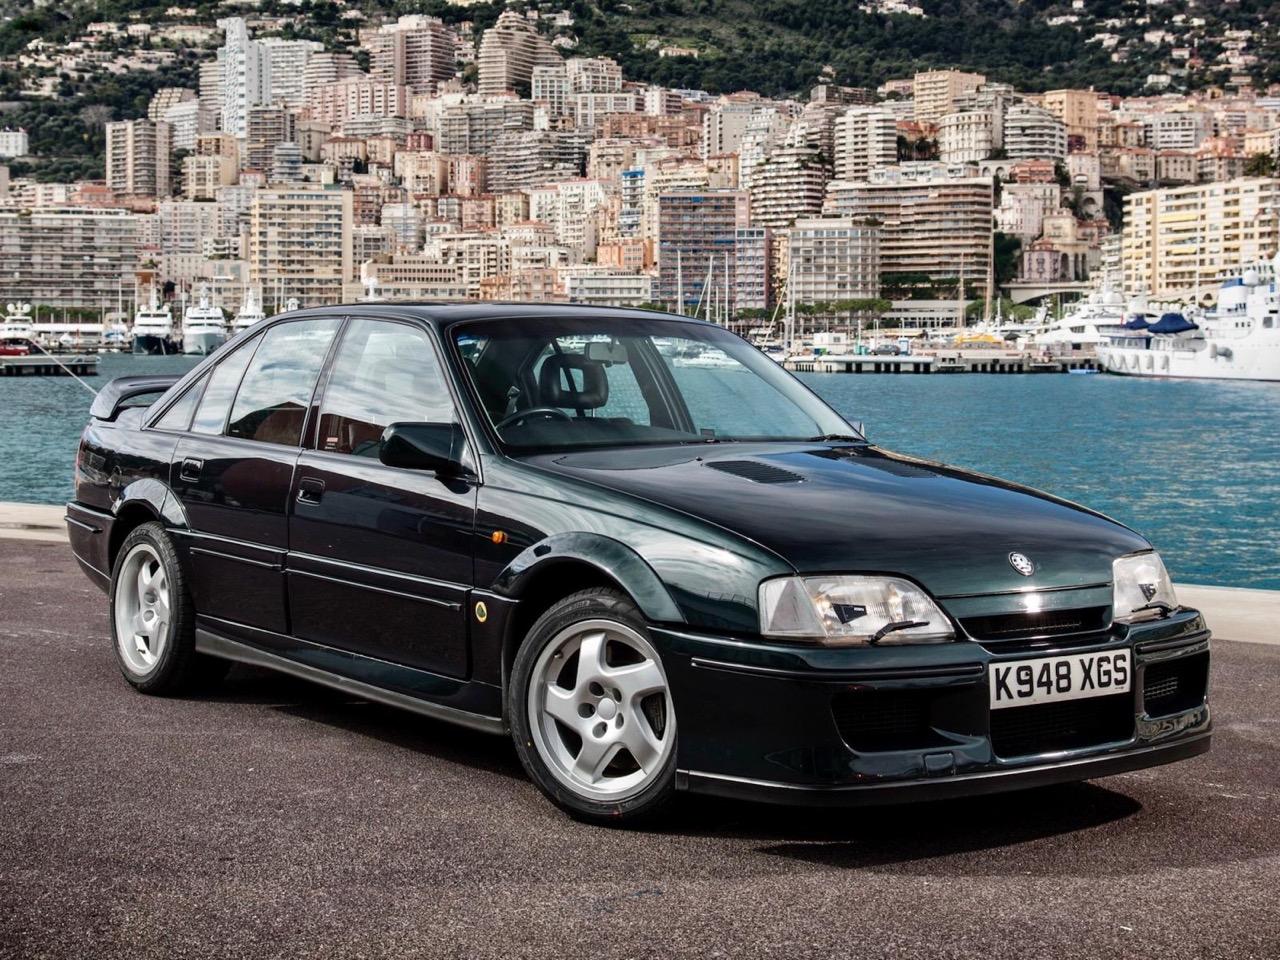 Opel Omega Lotus - Le monstre des 90's ! 55